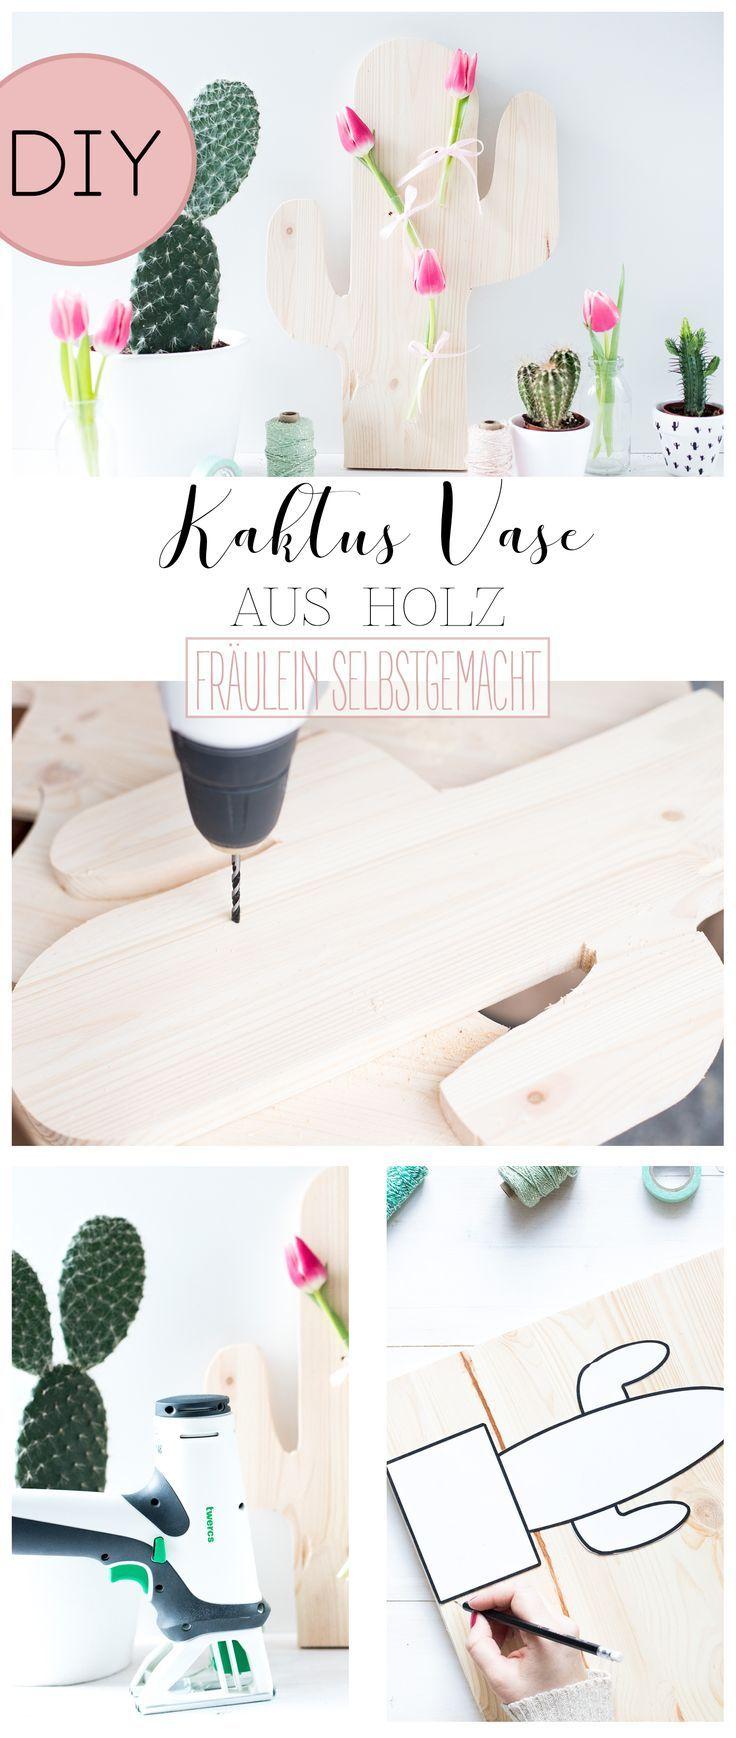 kaktus vase aus holz selber bauen mit der twercs toolbox | pinterest